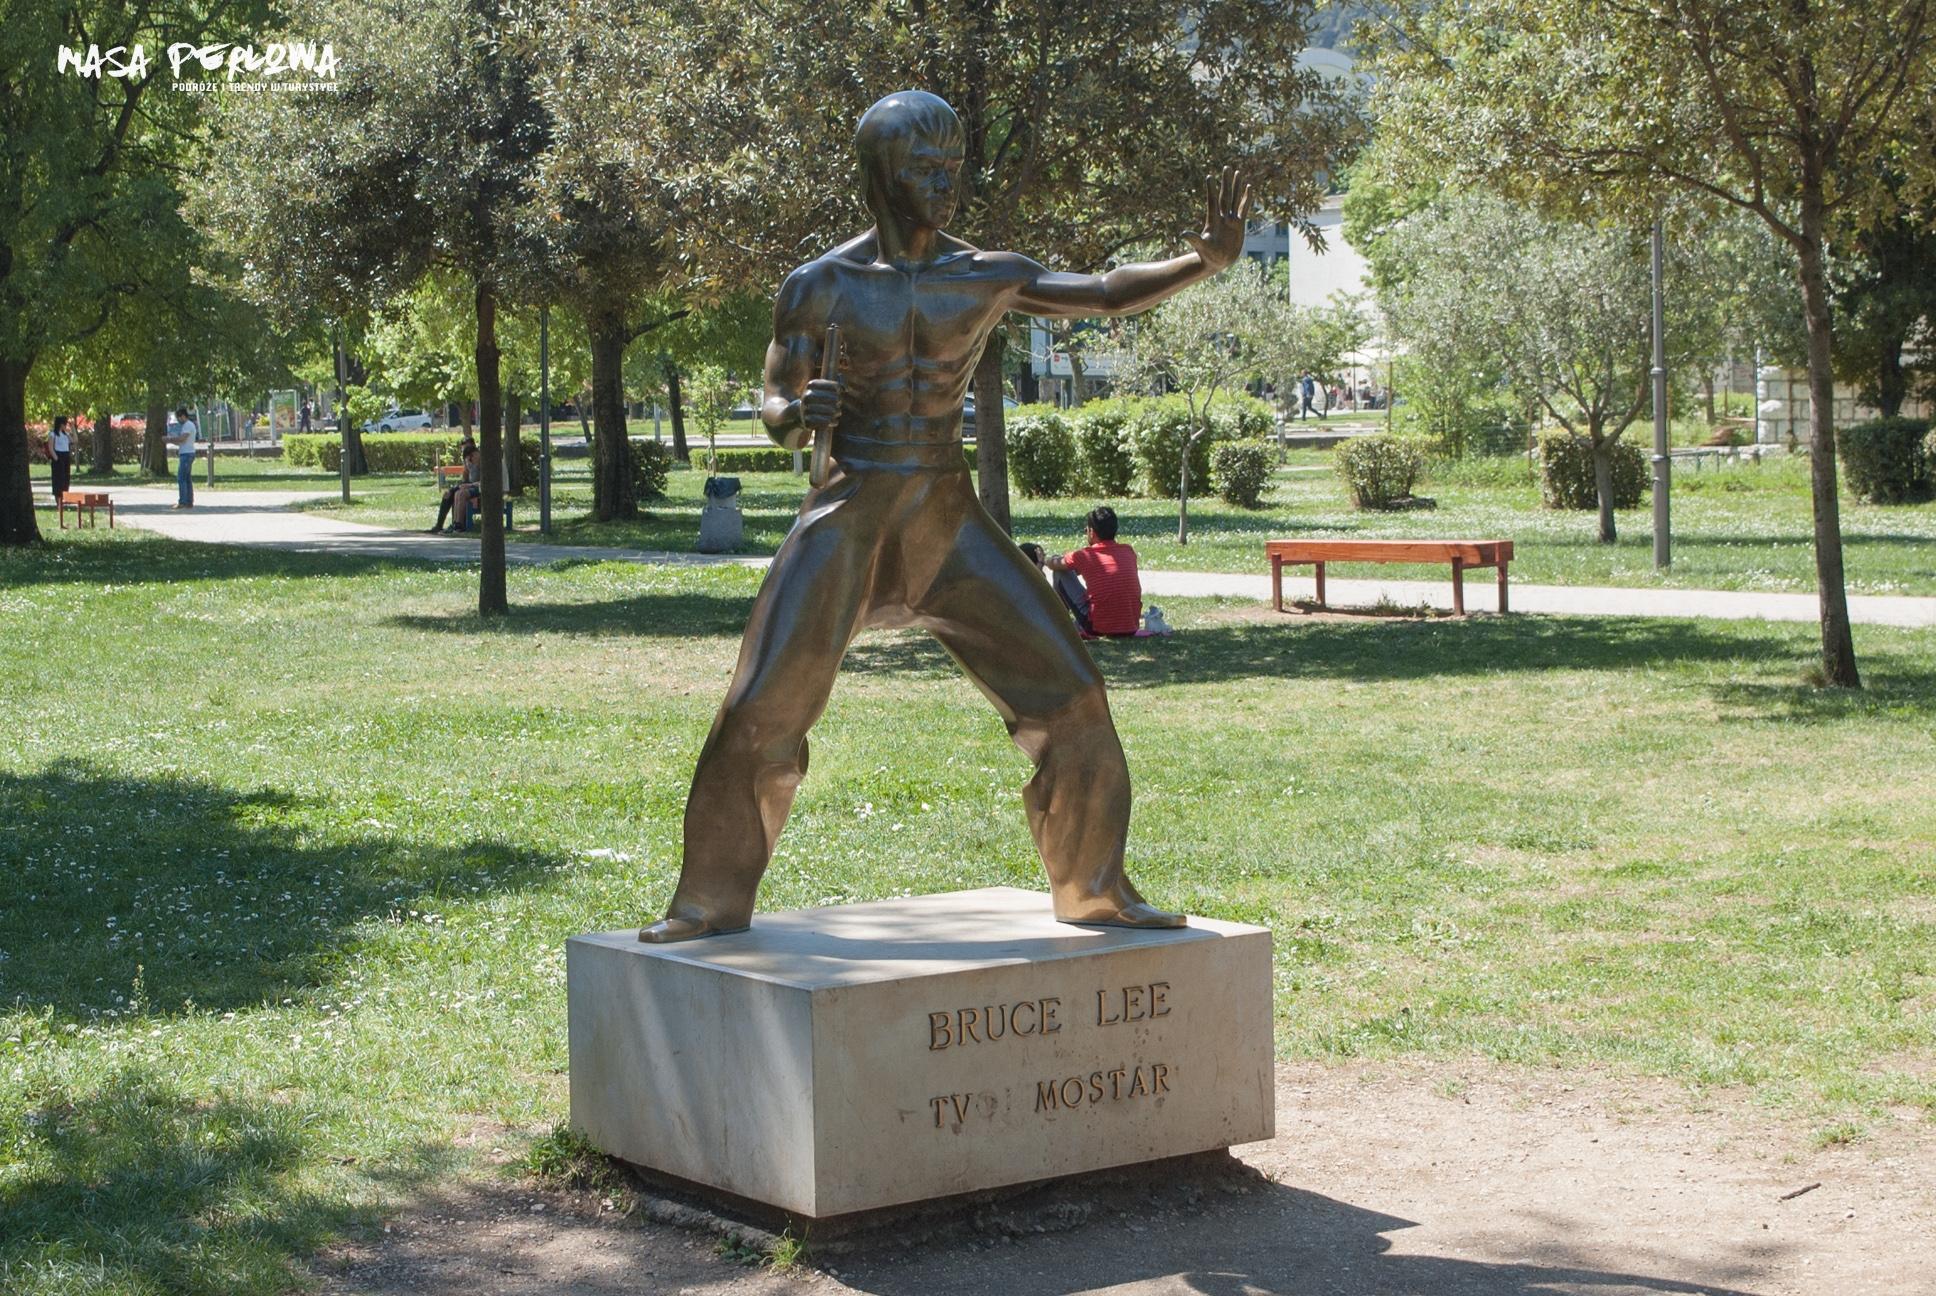 Mostar Bruce Lee pomnik